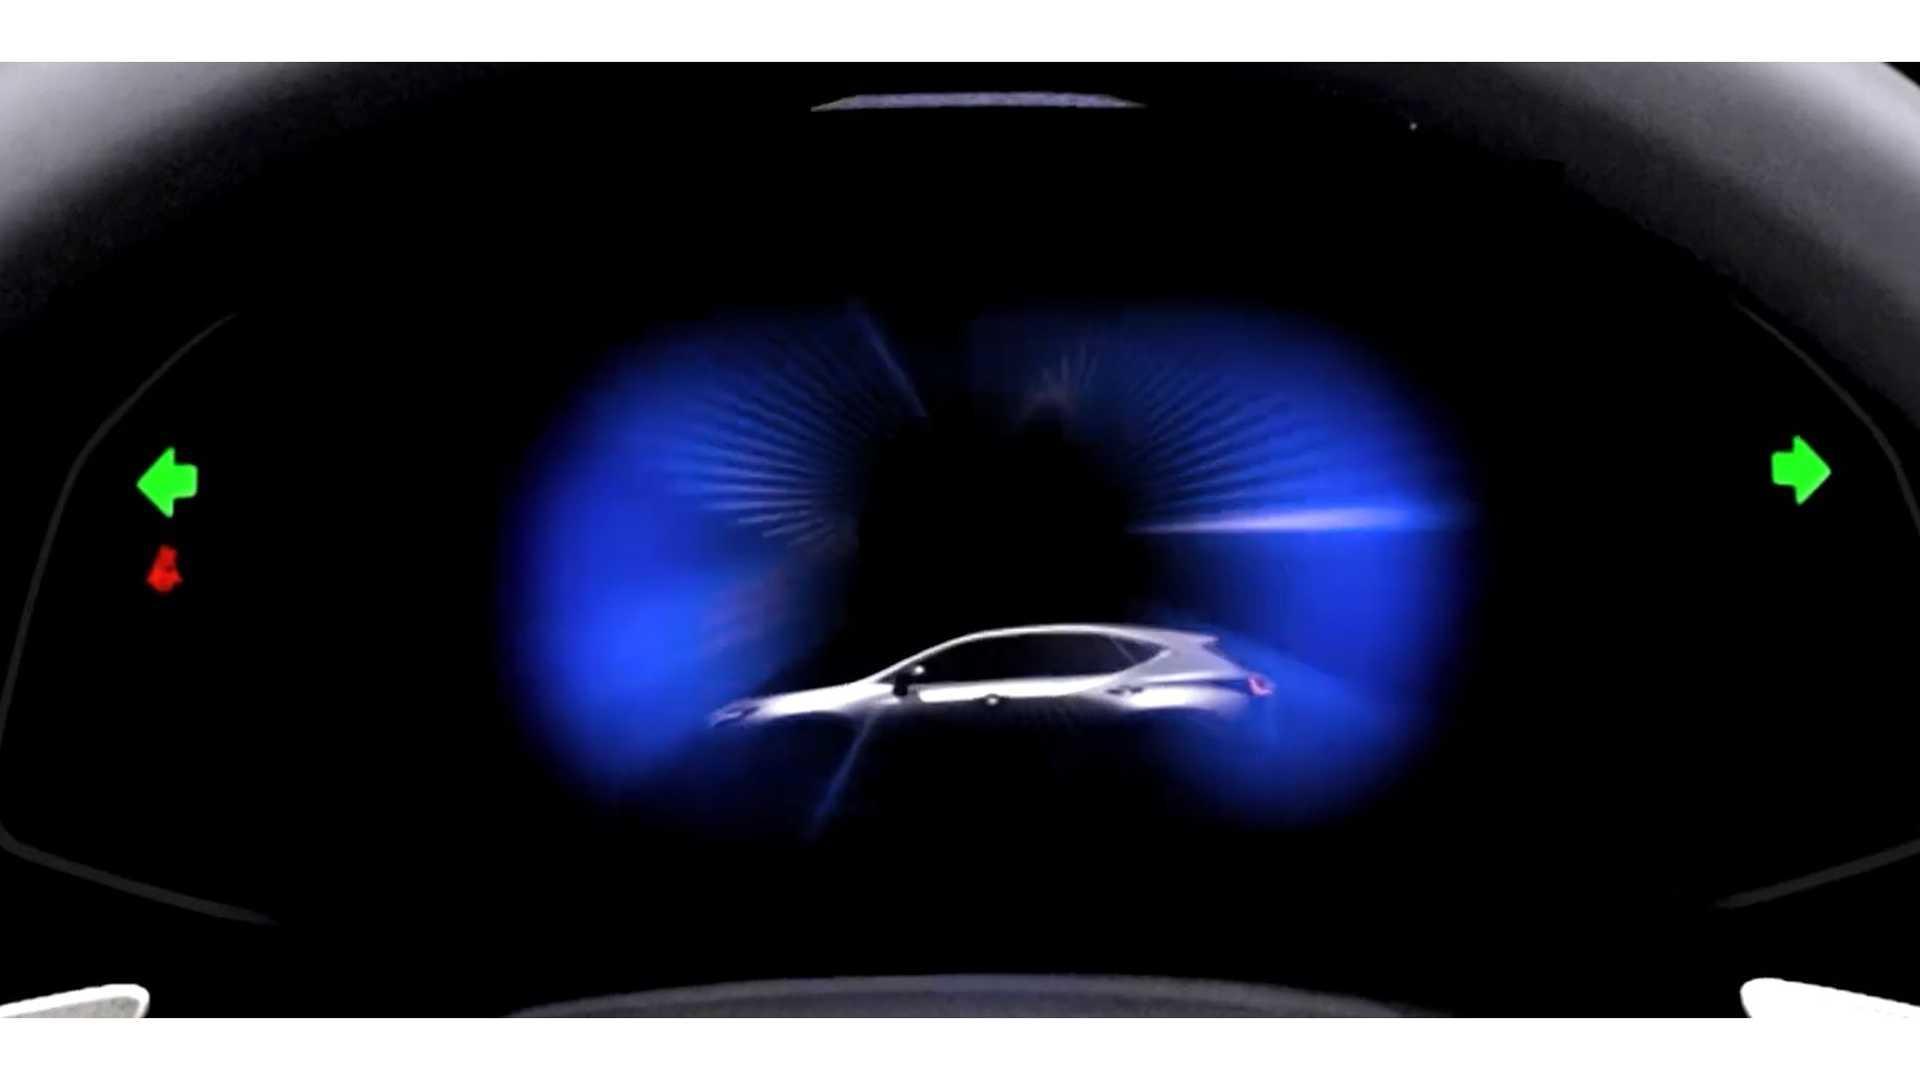 2022-lexus-nx-screenshot-from-leaked-official-video (4).jpg